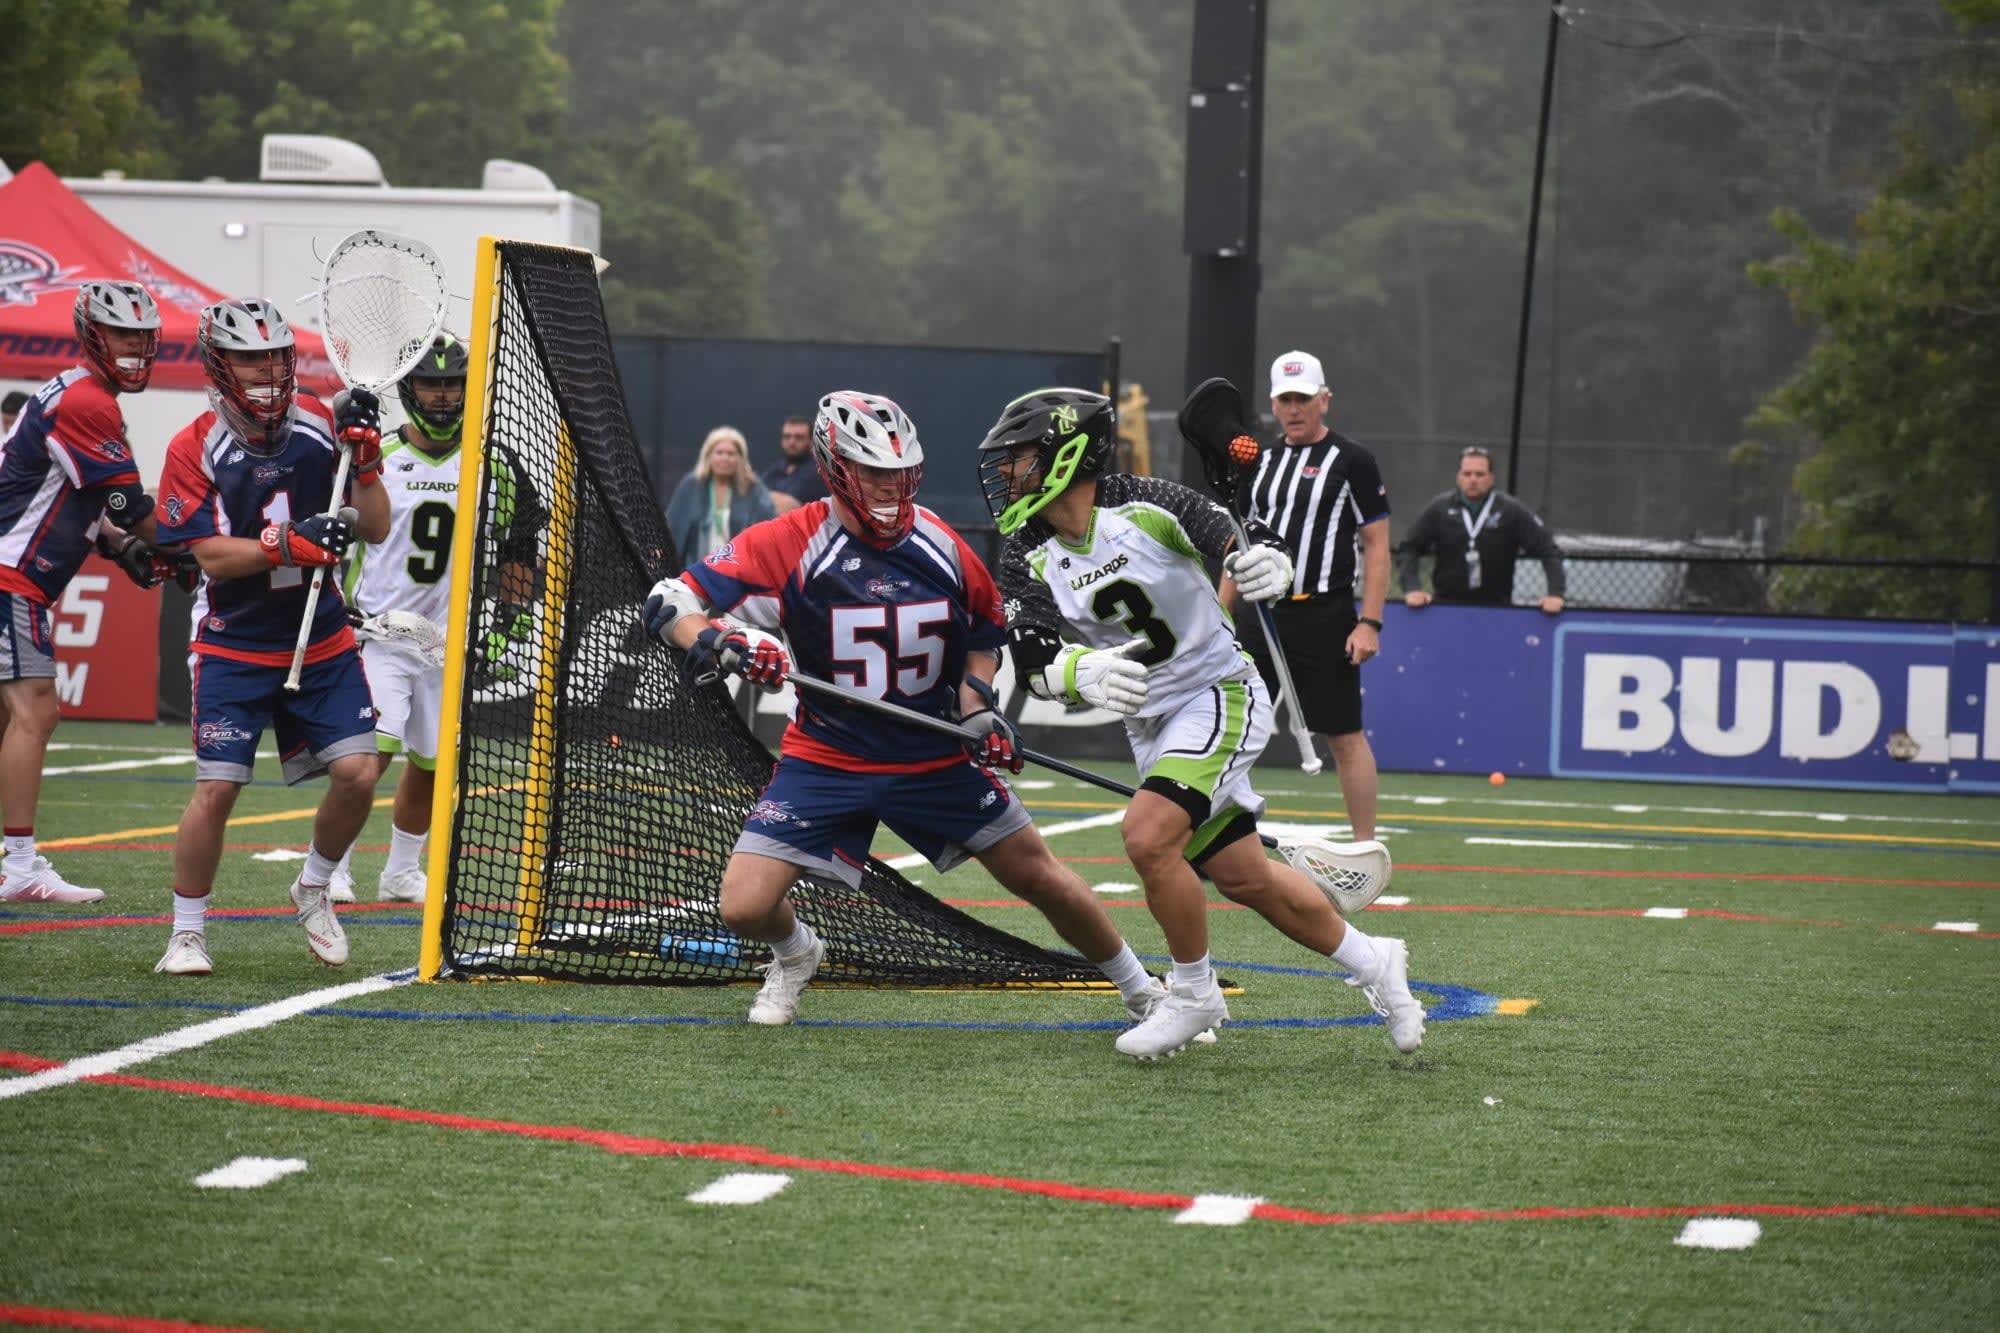 mll major league lacrosse 2019 mll week 1